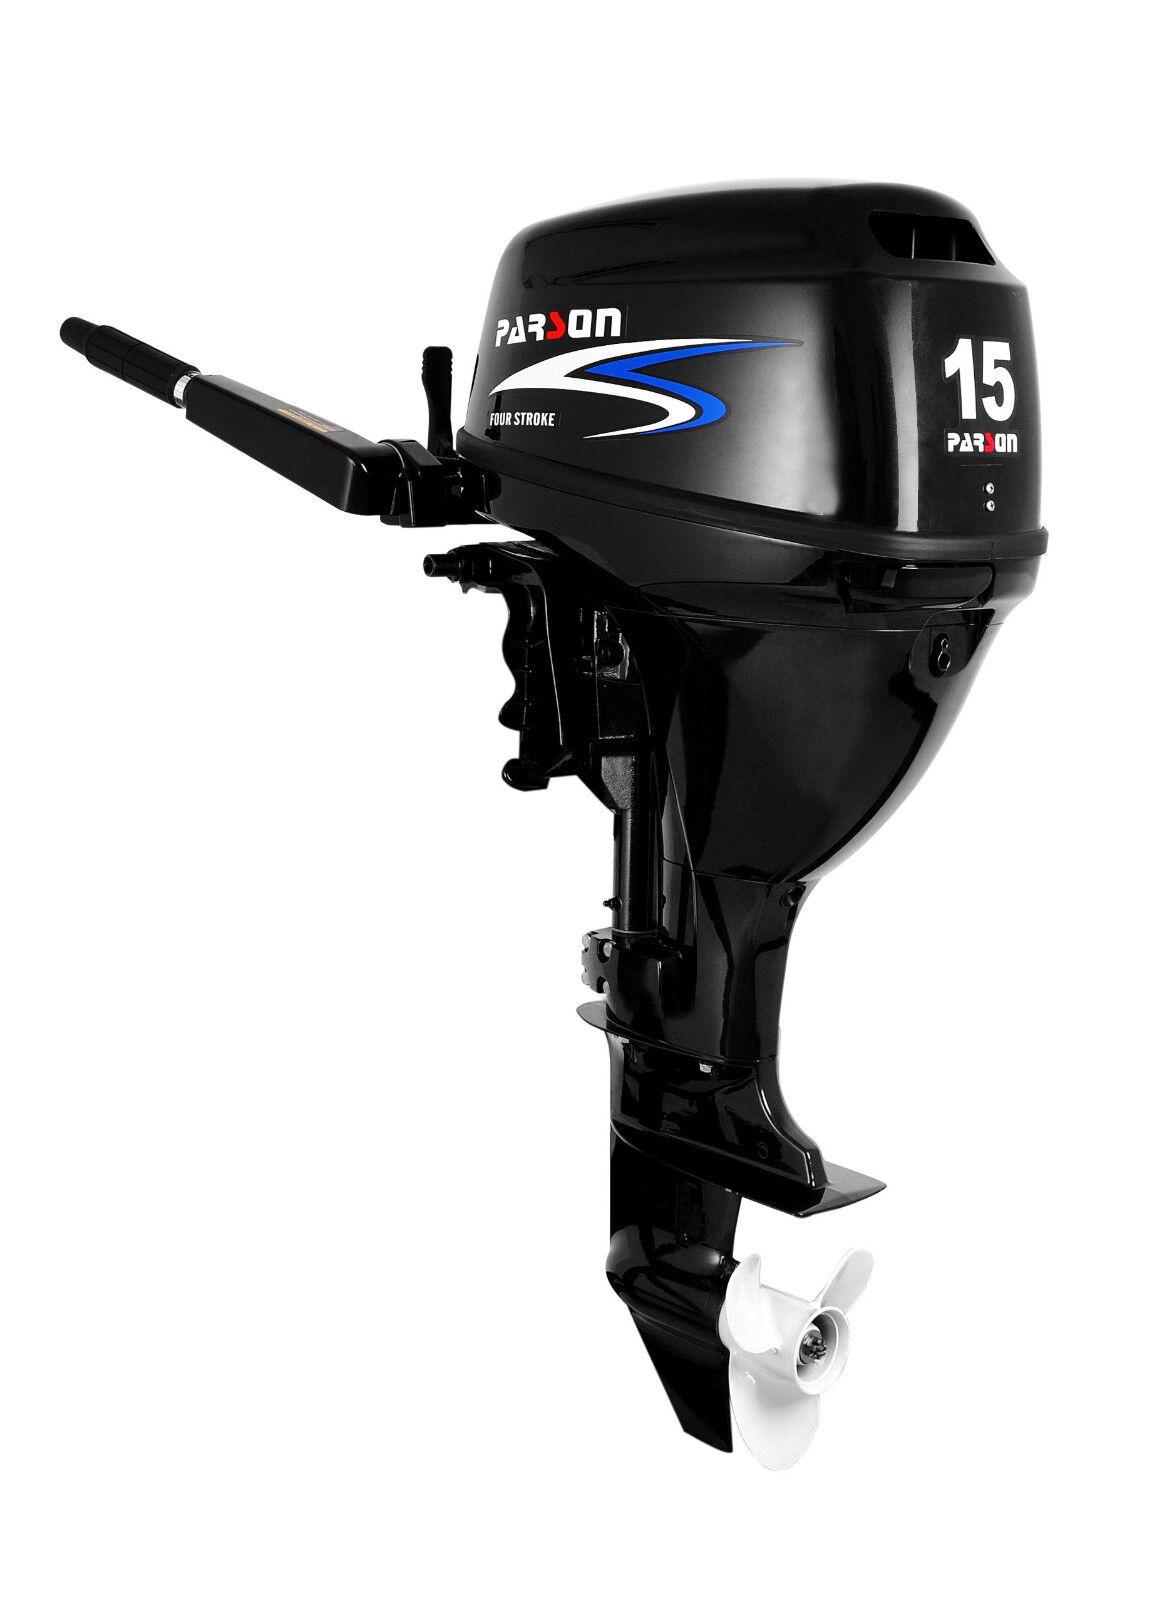 15PS FWL Parson Parsun / Parson FWL Außenbordmotor/Außenborder Langschaft, FB, E-Start 4dd7c2